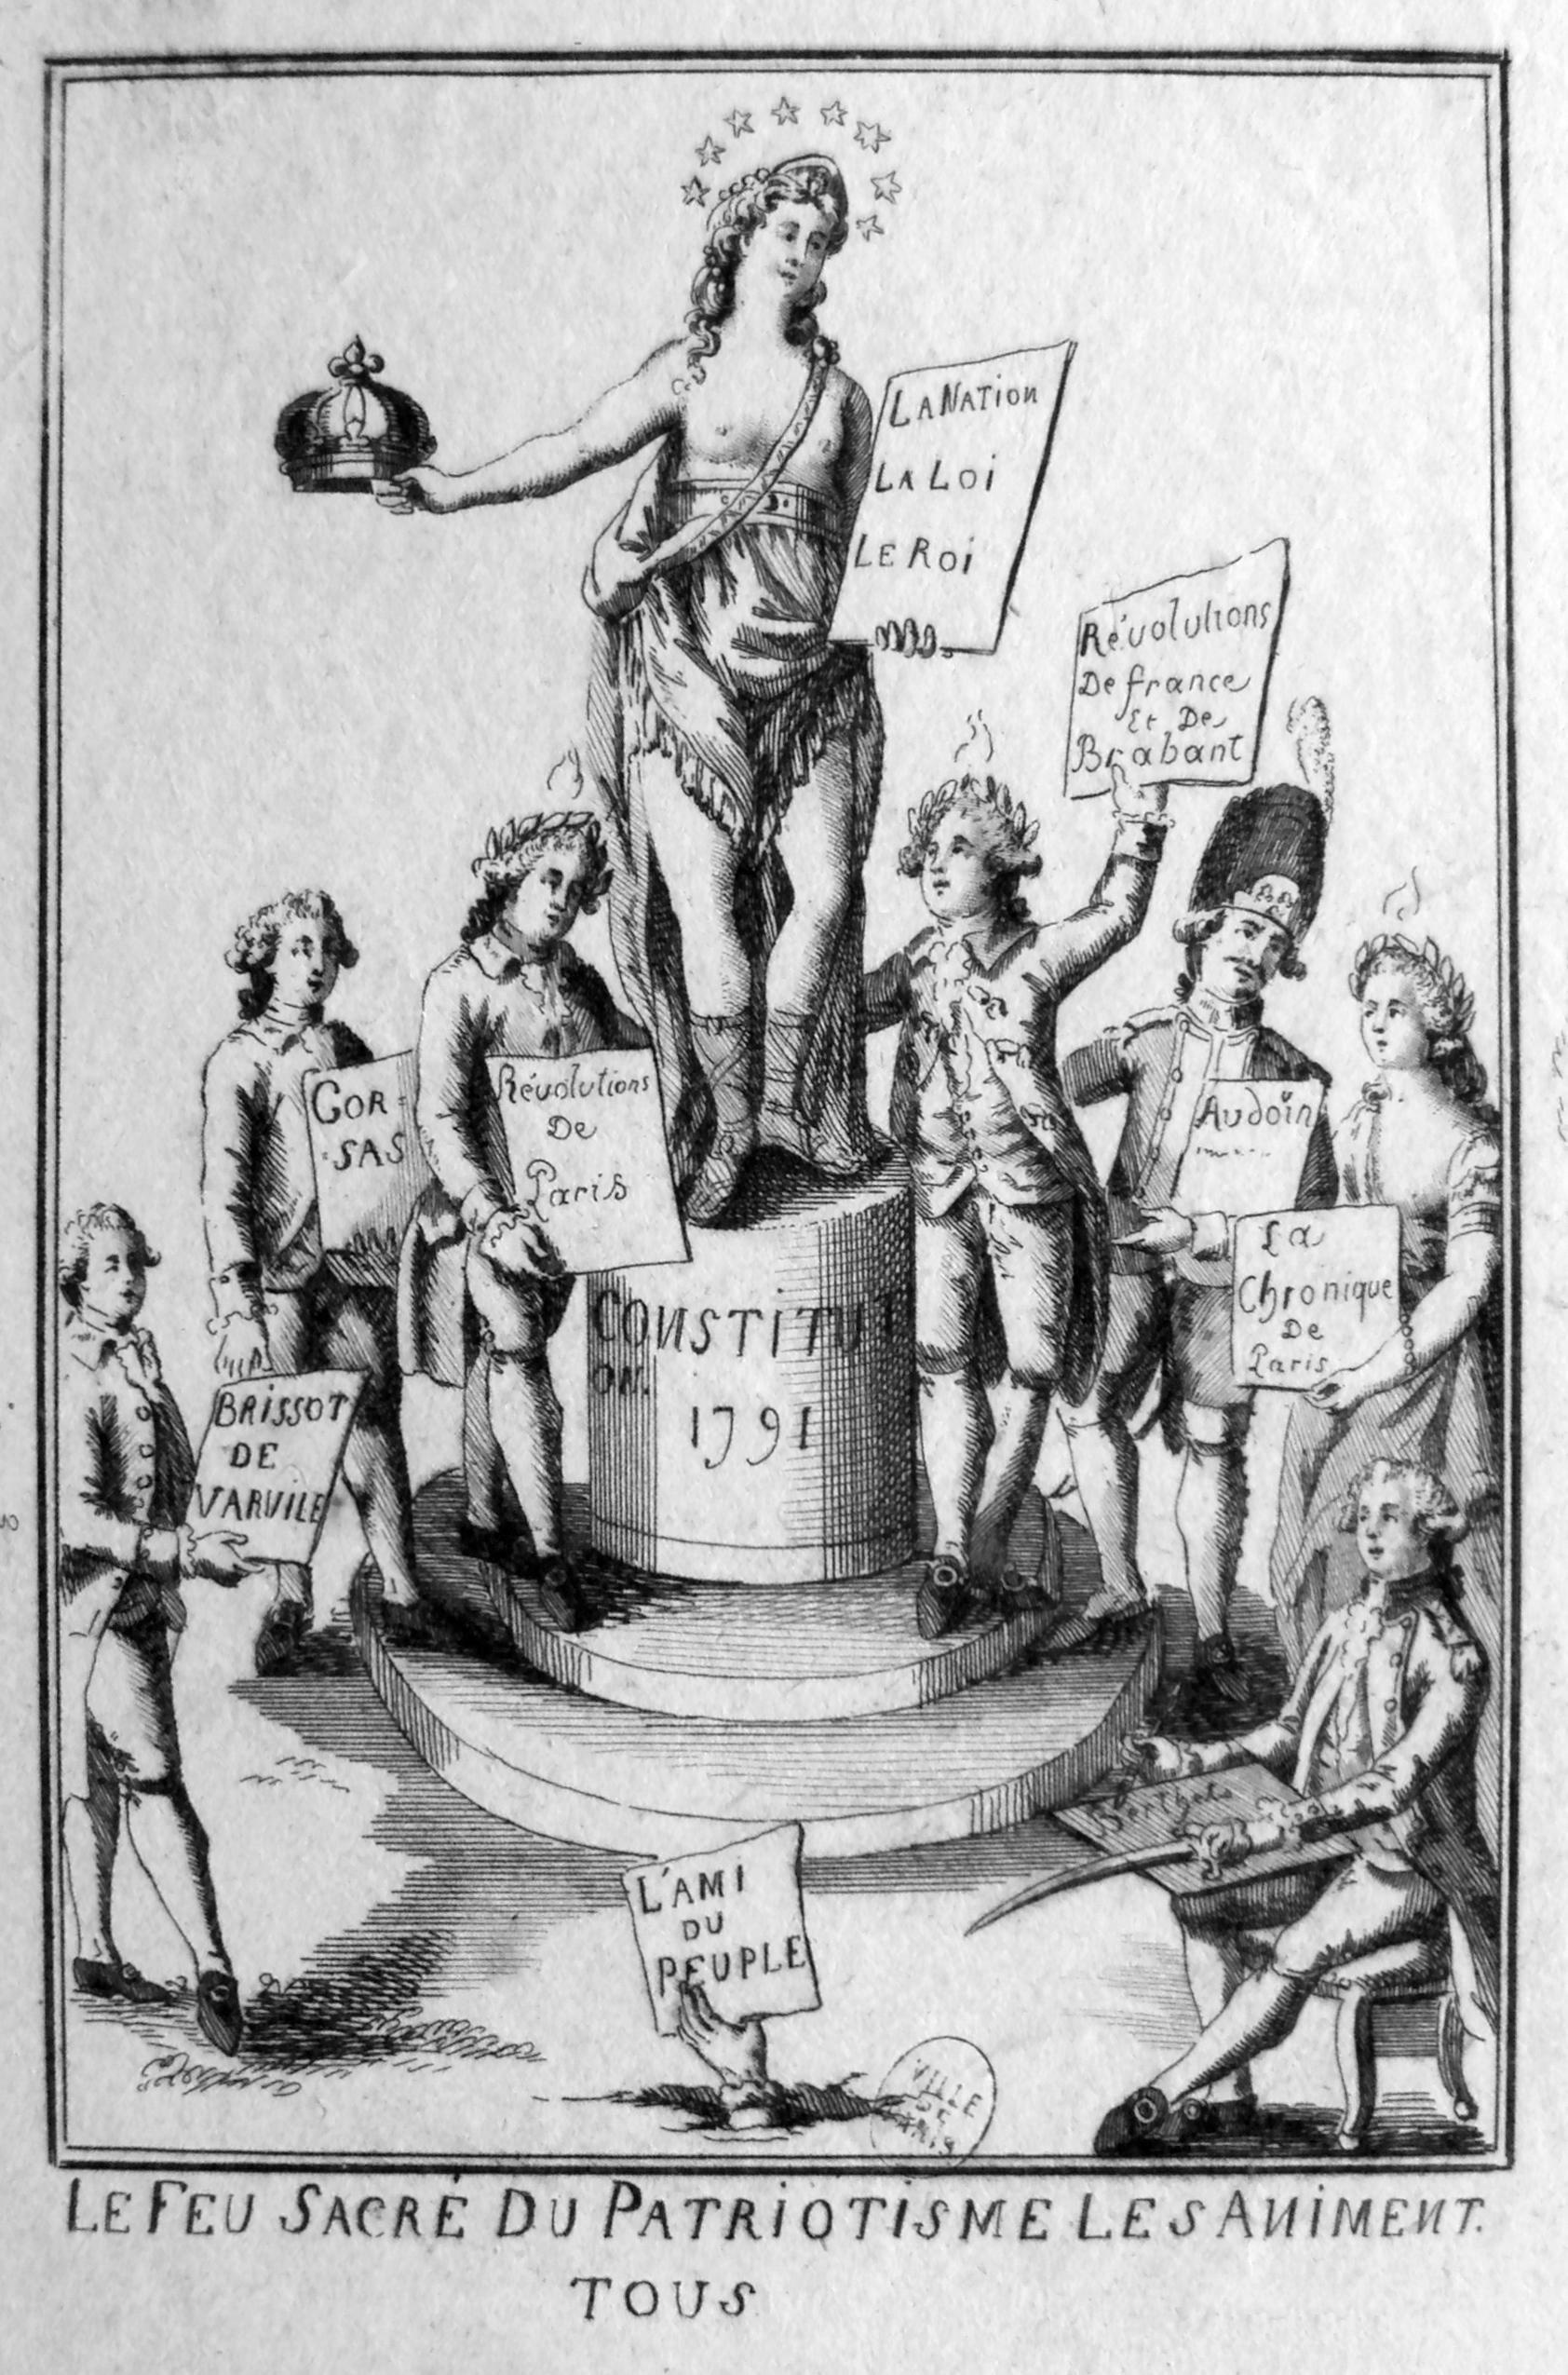 """Das heilige Feuer des Patriotismus"" 1791 IMG"